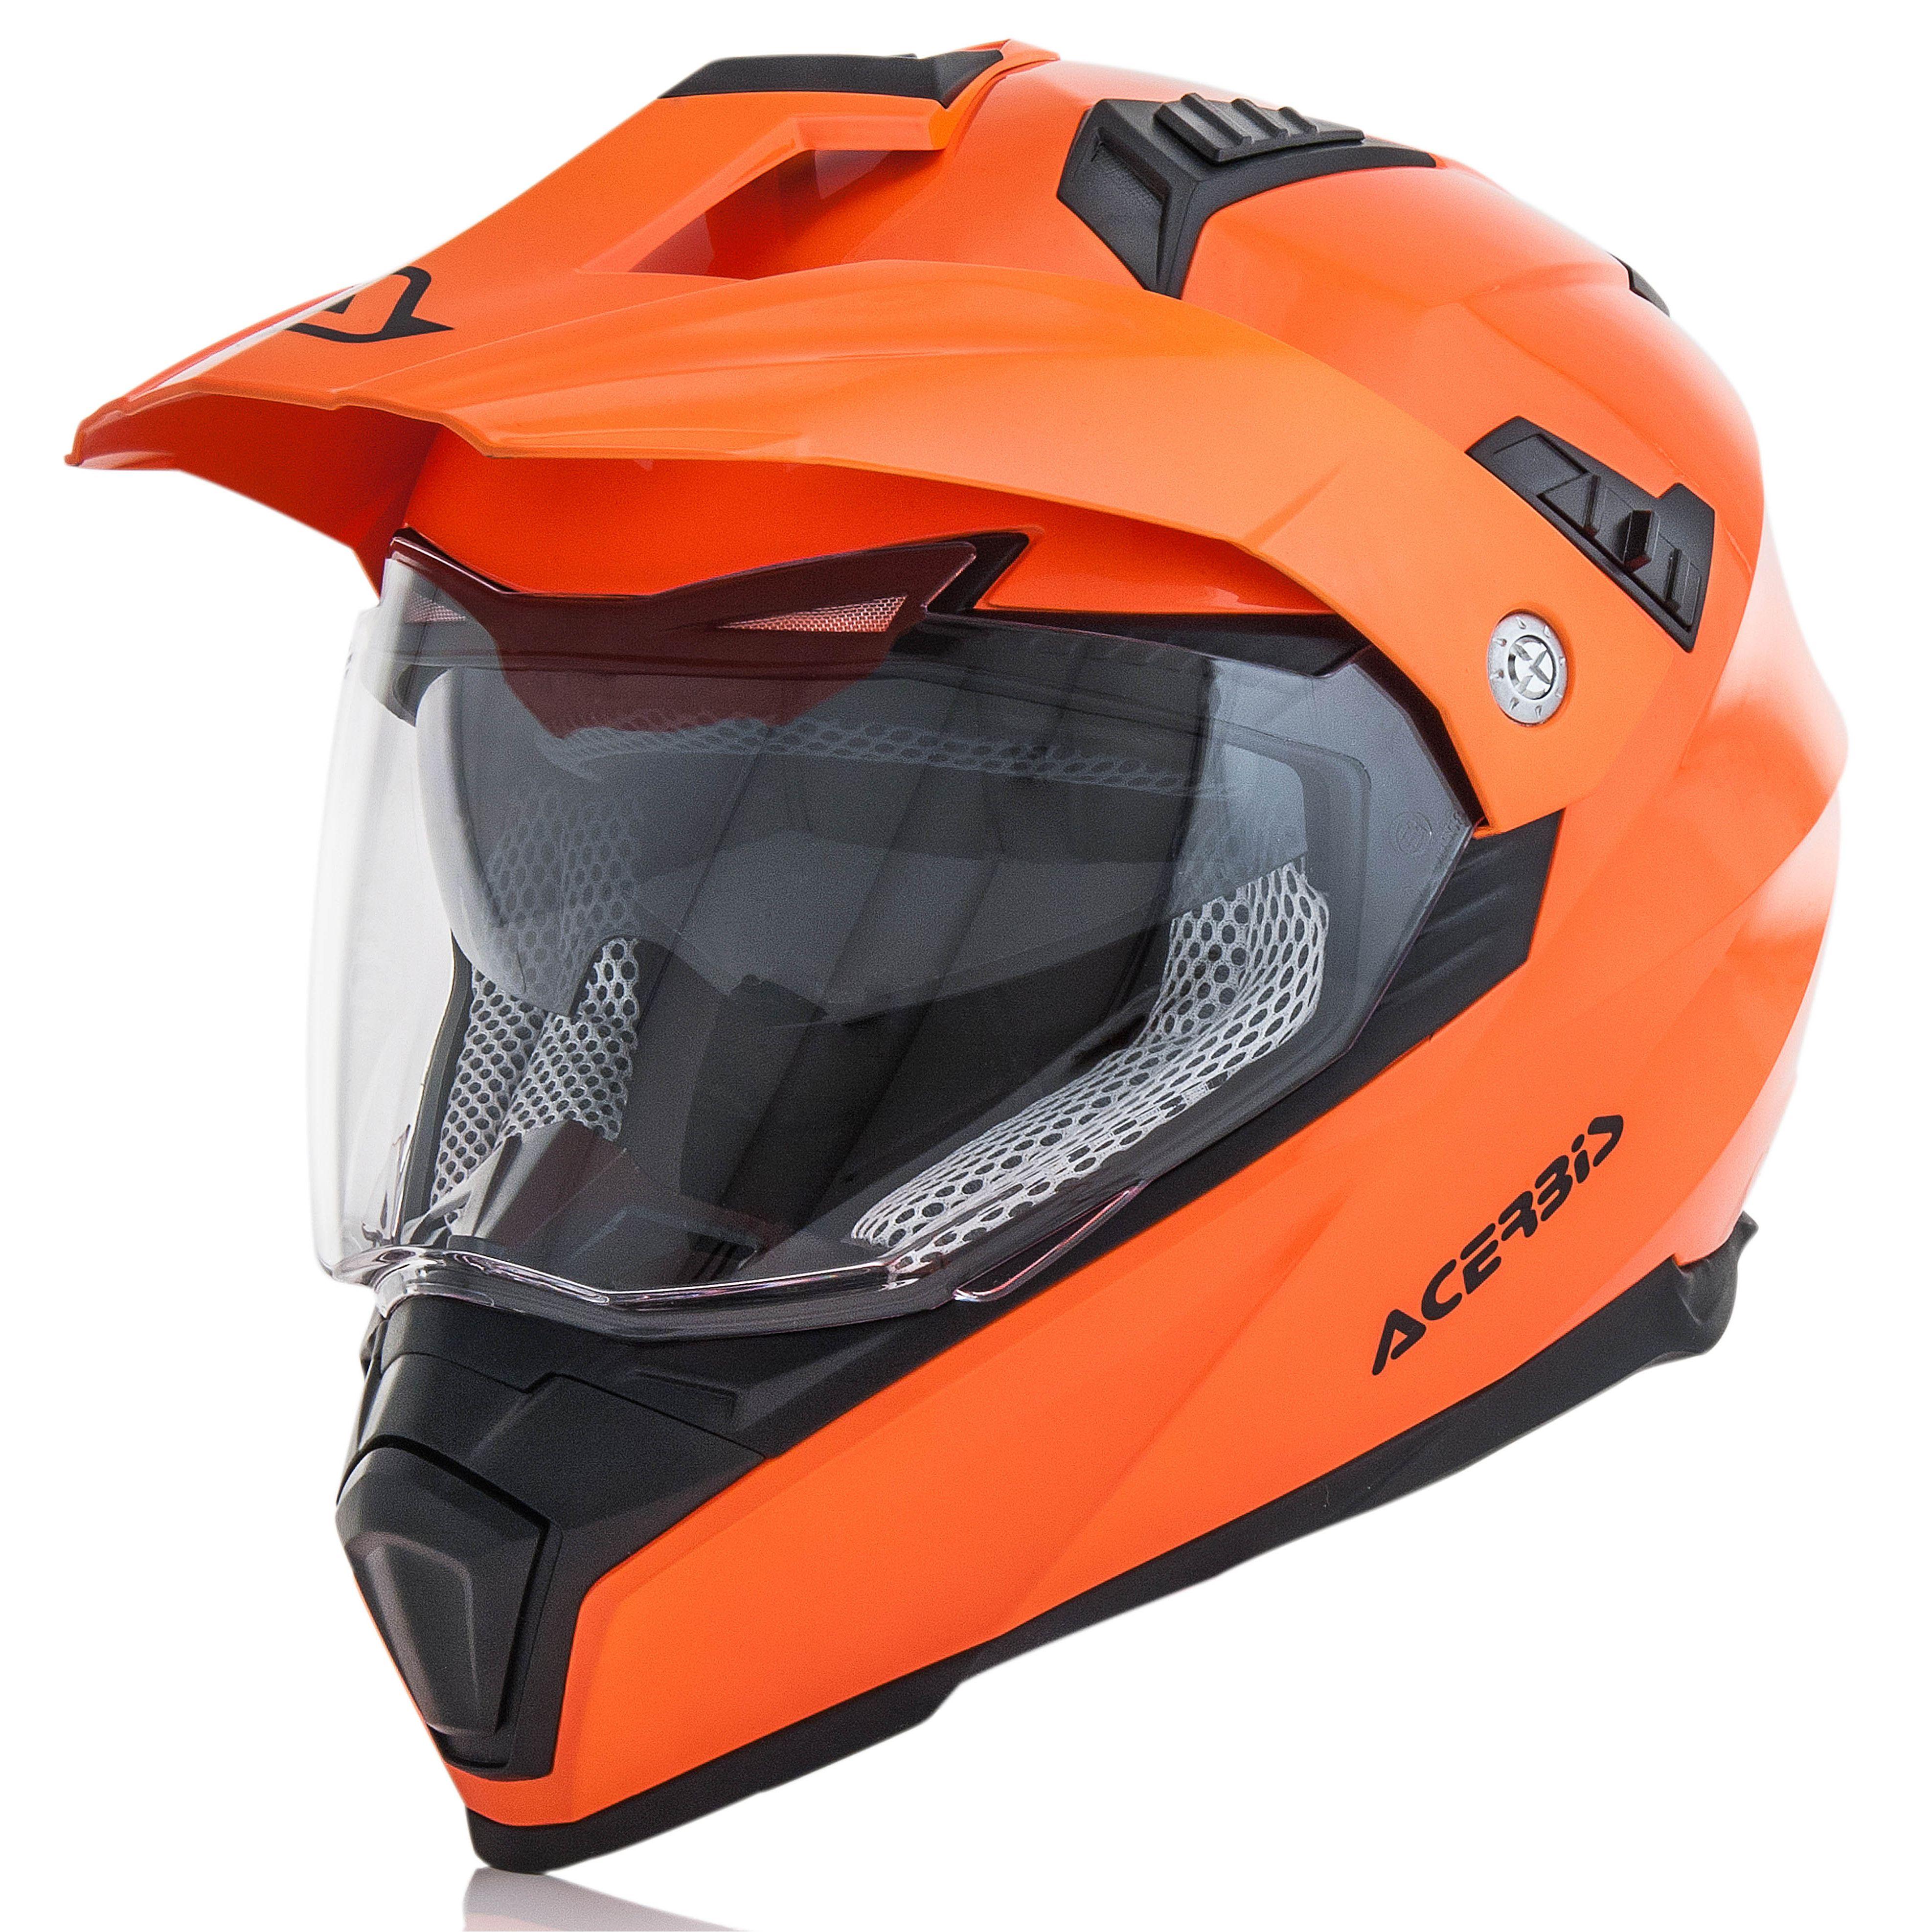 Casco De Motocross Acerbis Flip Fs 606 Naranja Fl 218 Or